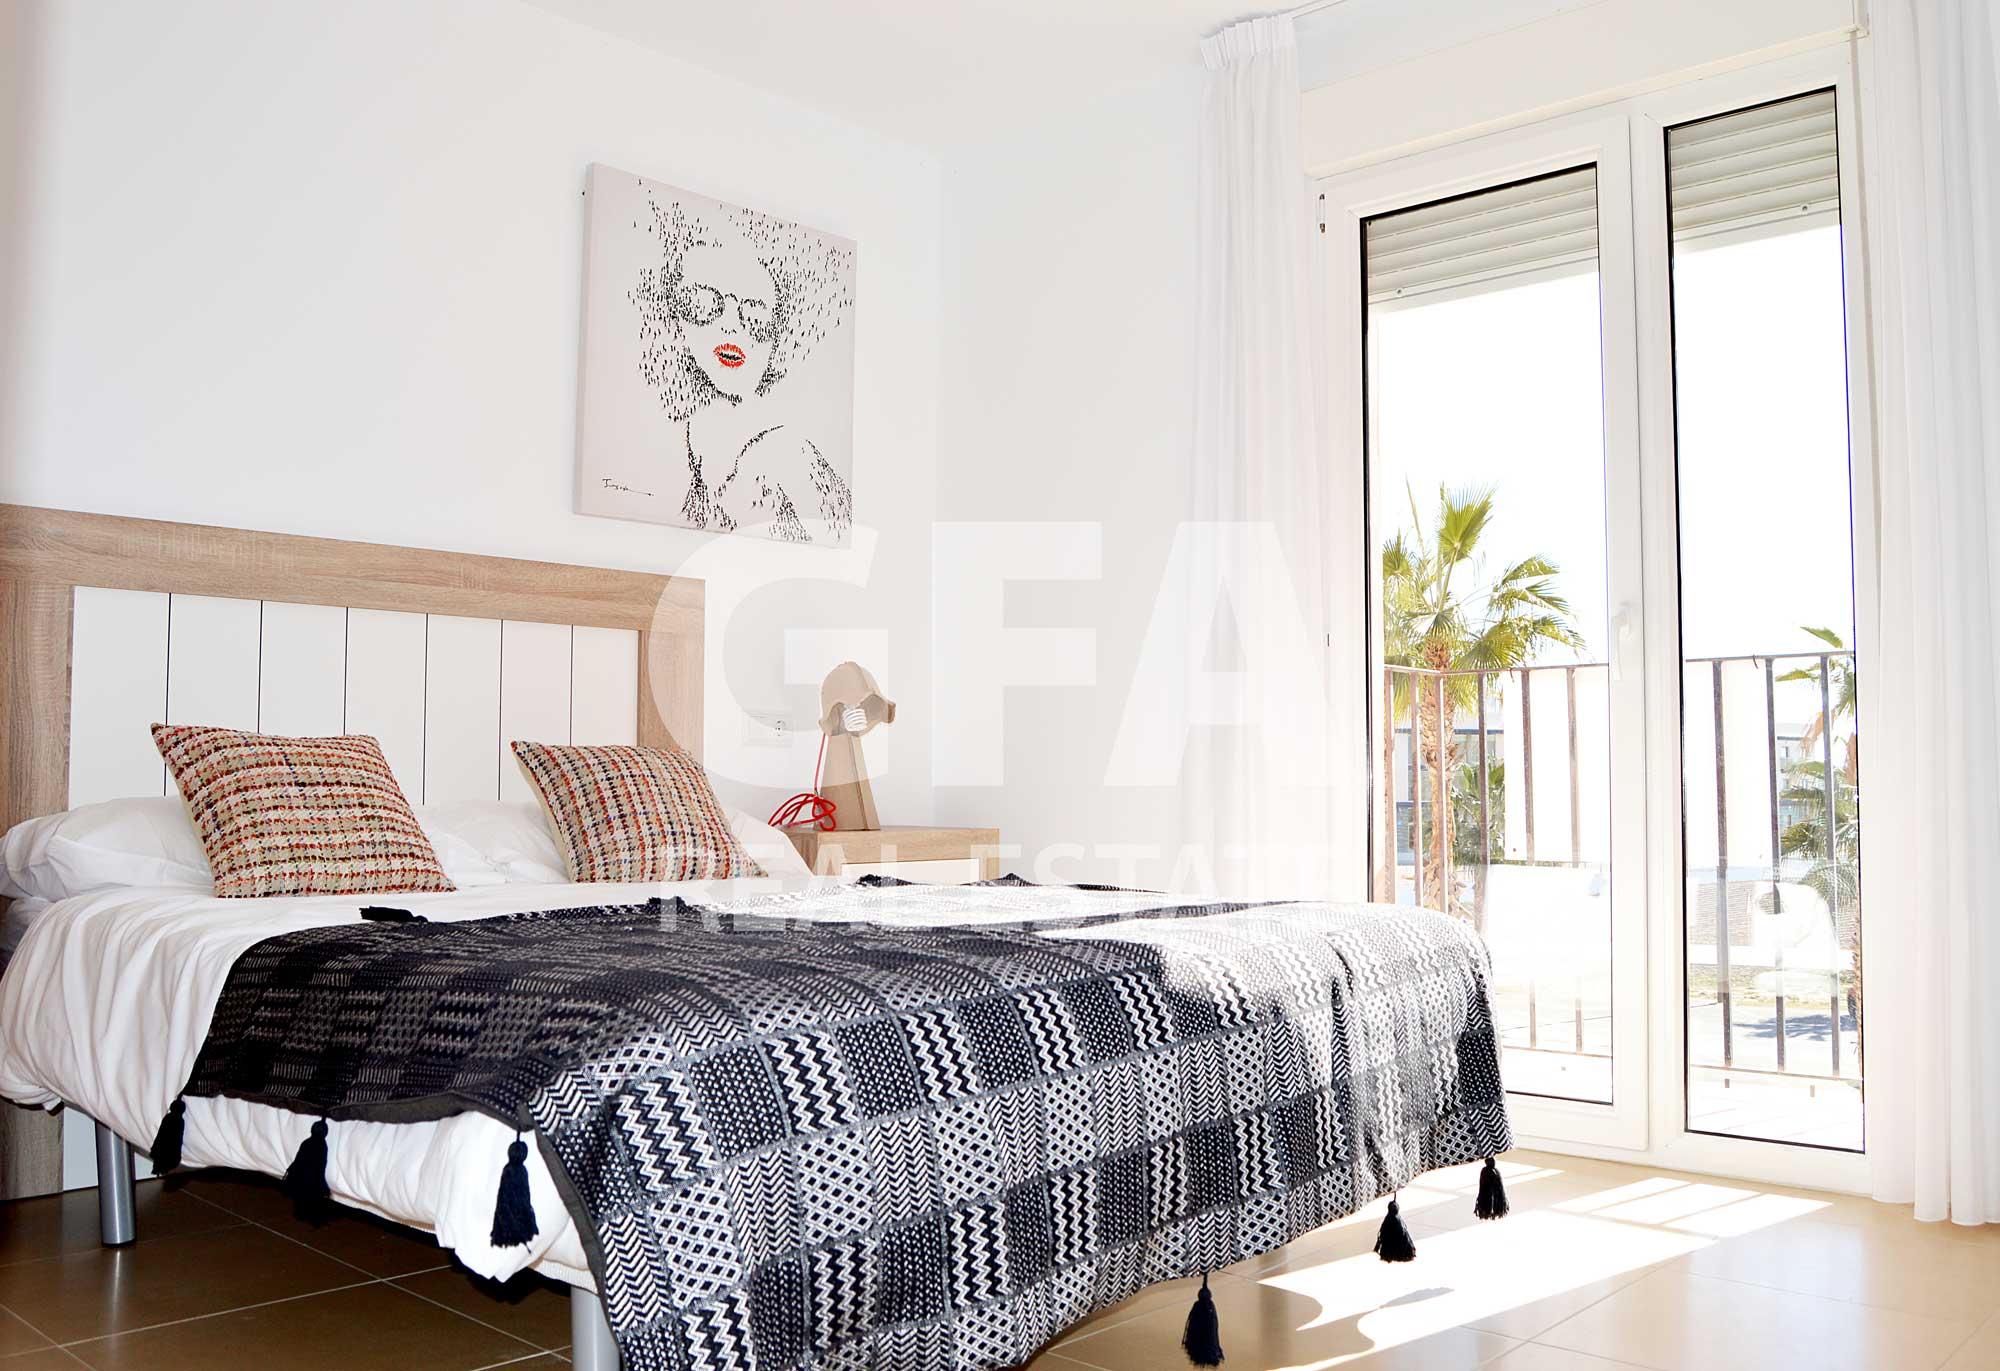 boulevard-viviendas-de-obra-nueva-resort-mar-menor (28)